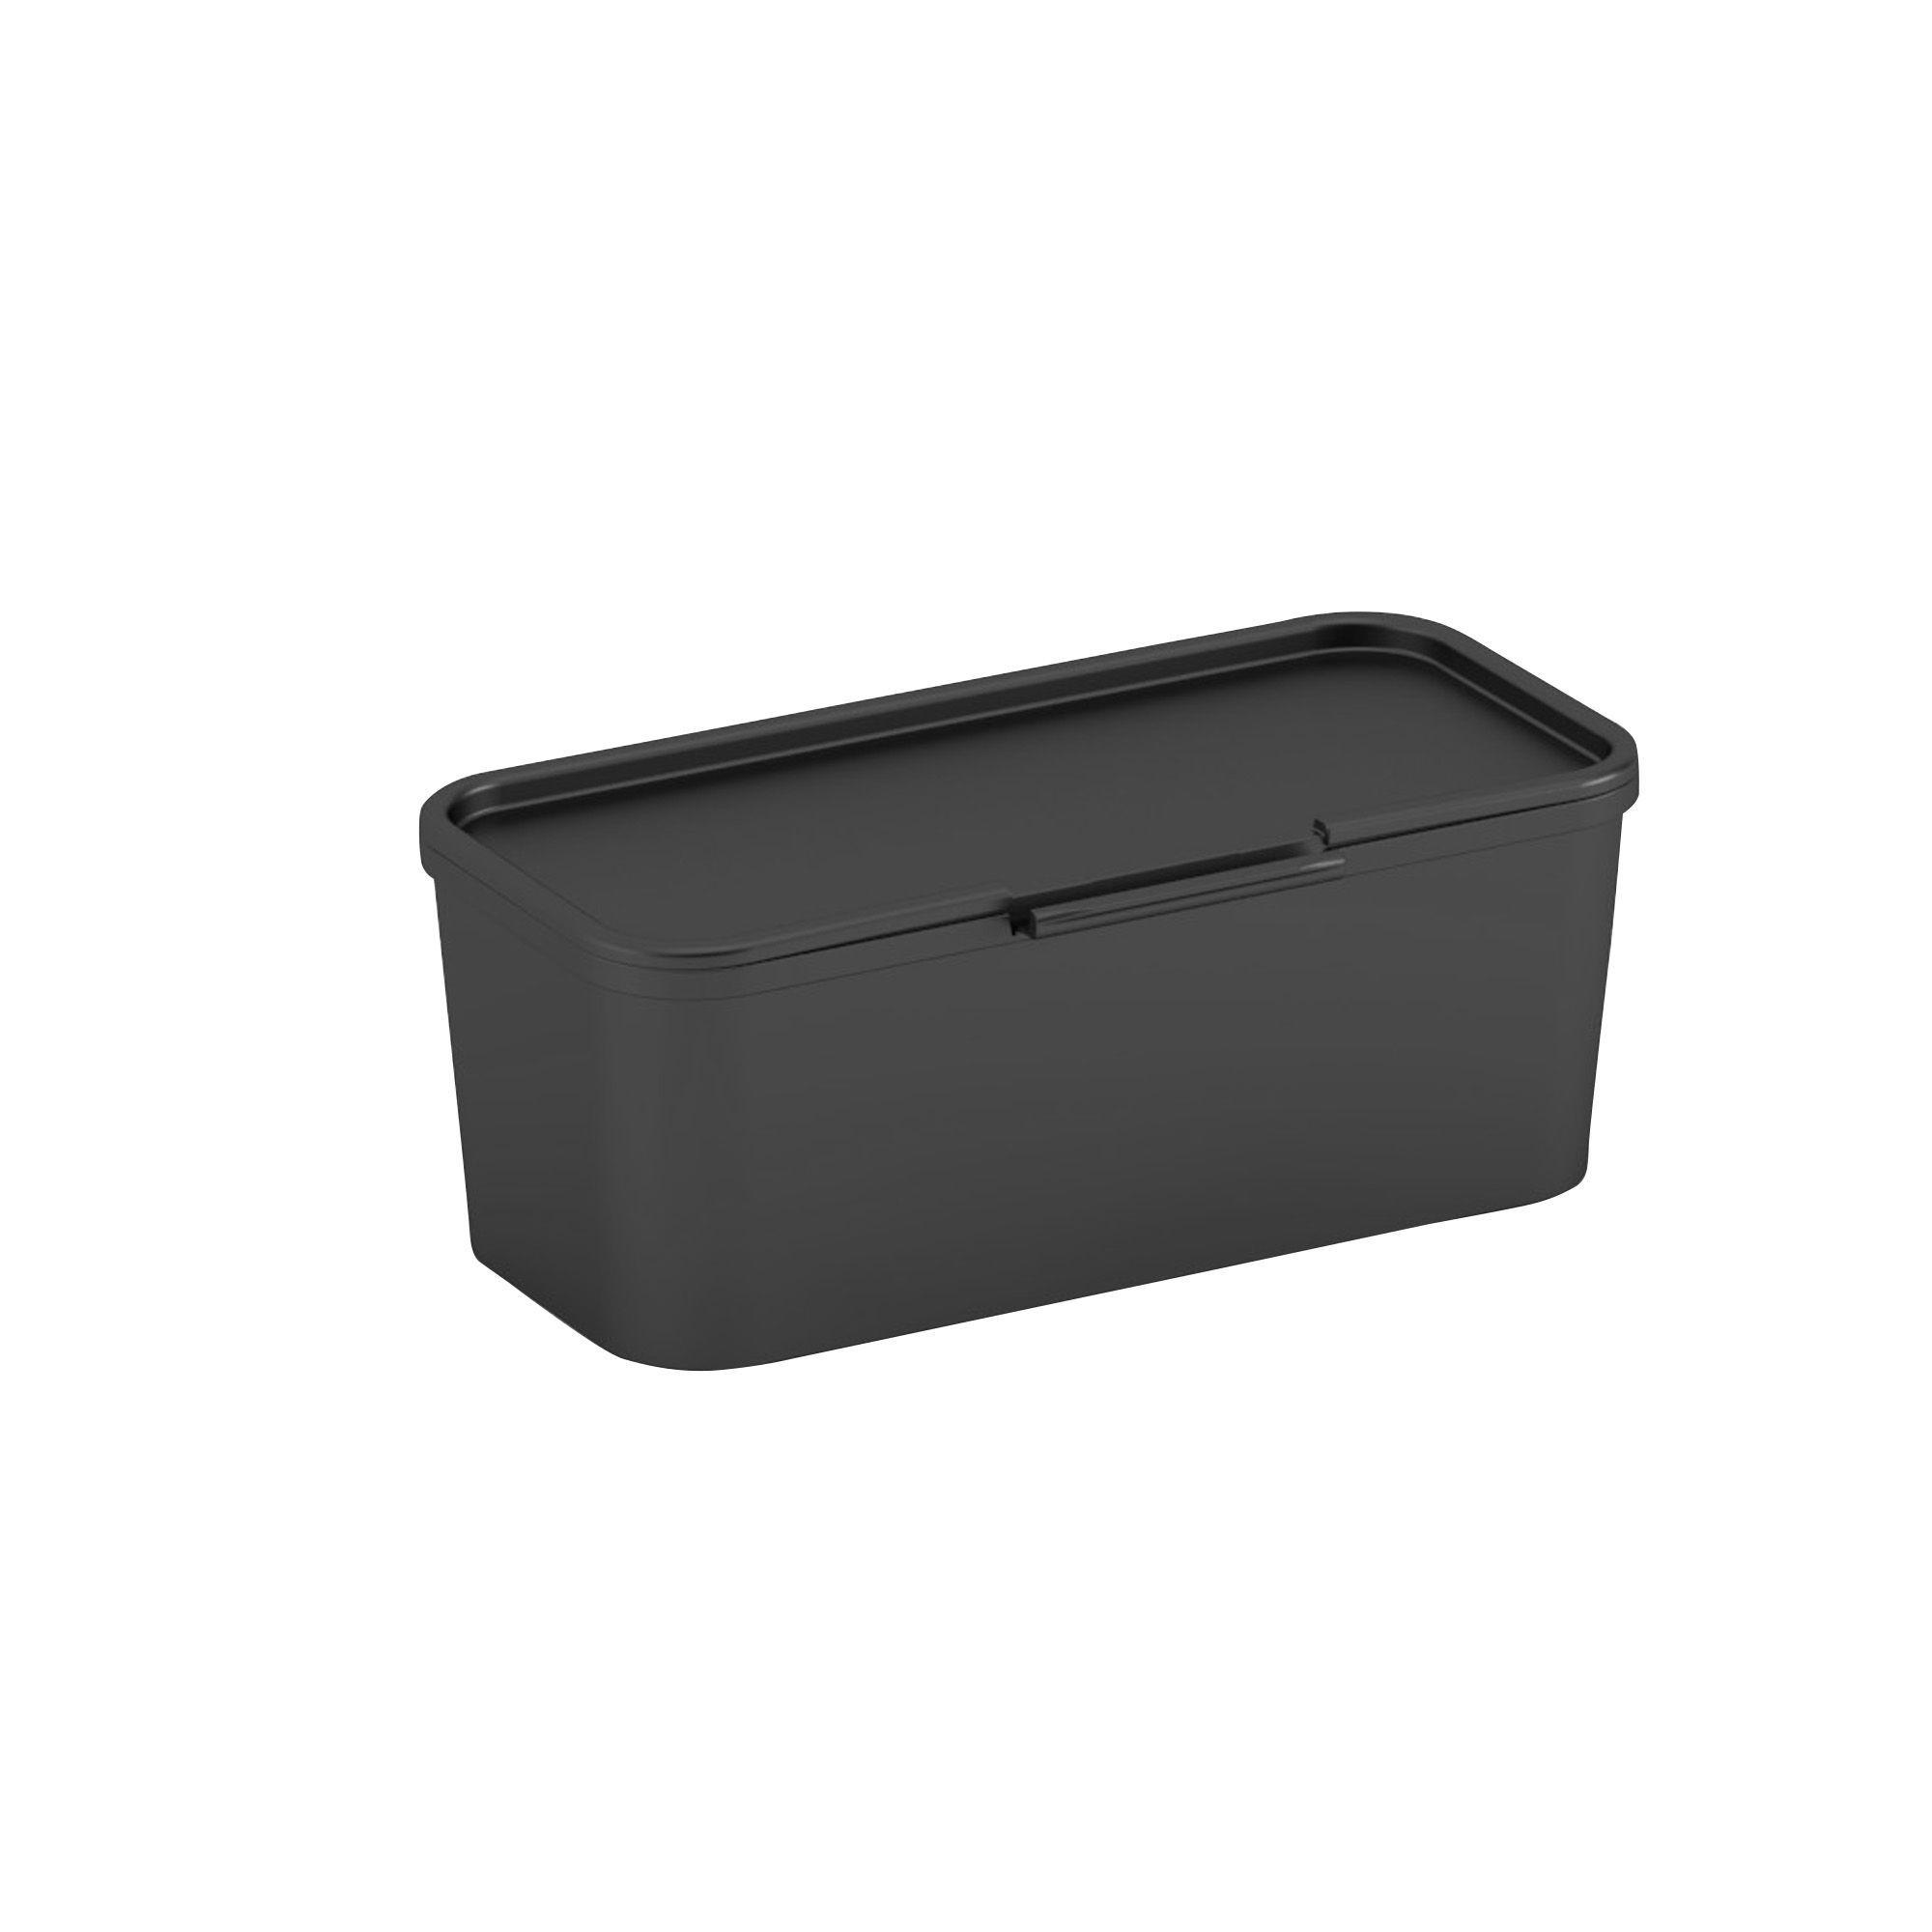 Form Flexi Store Black Plastic Storage Divider Pot